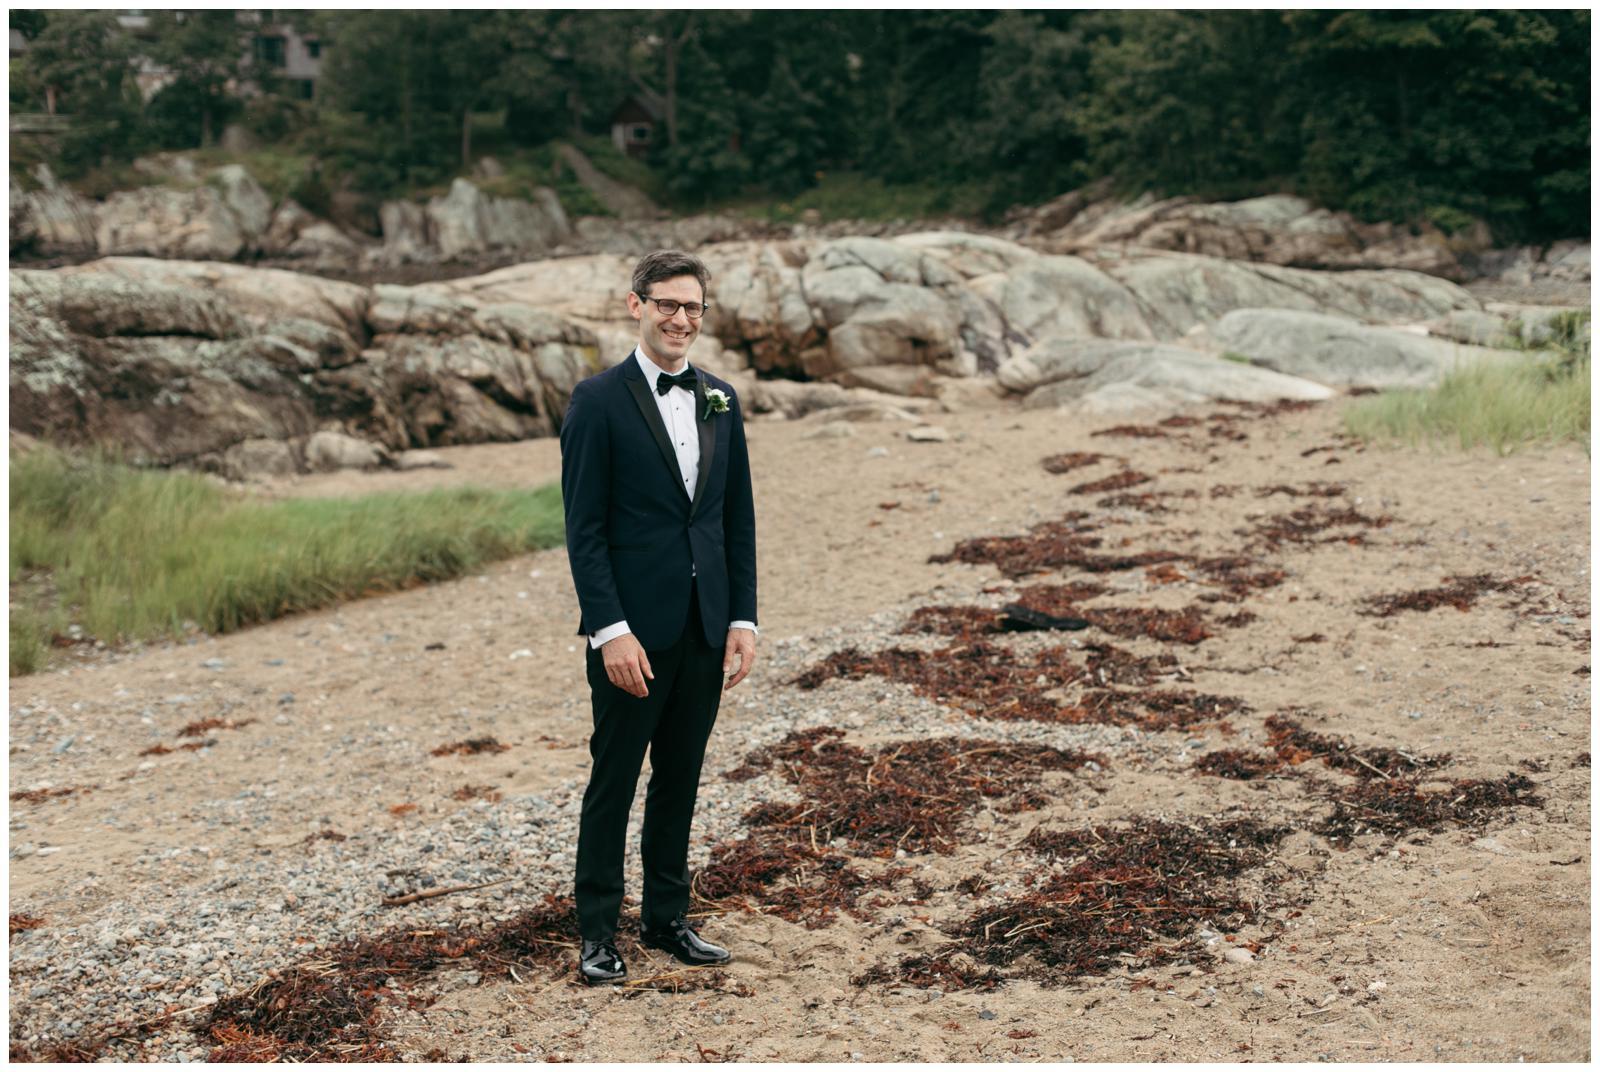 Manchester-by-the-sea wedding photos